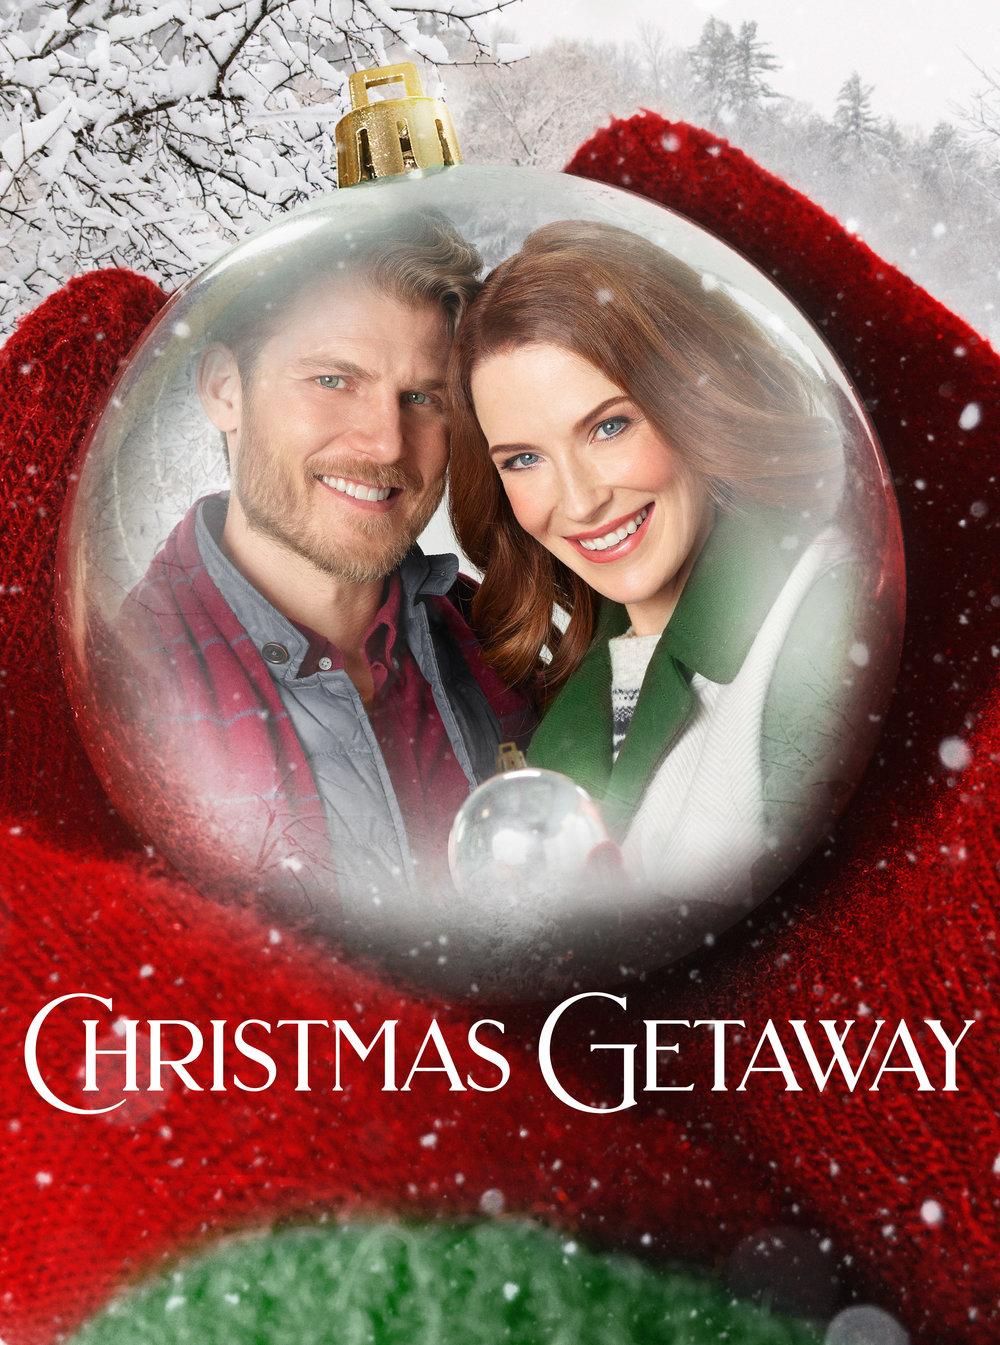 ChristmasGetaway_FKA.jpg